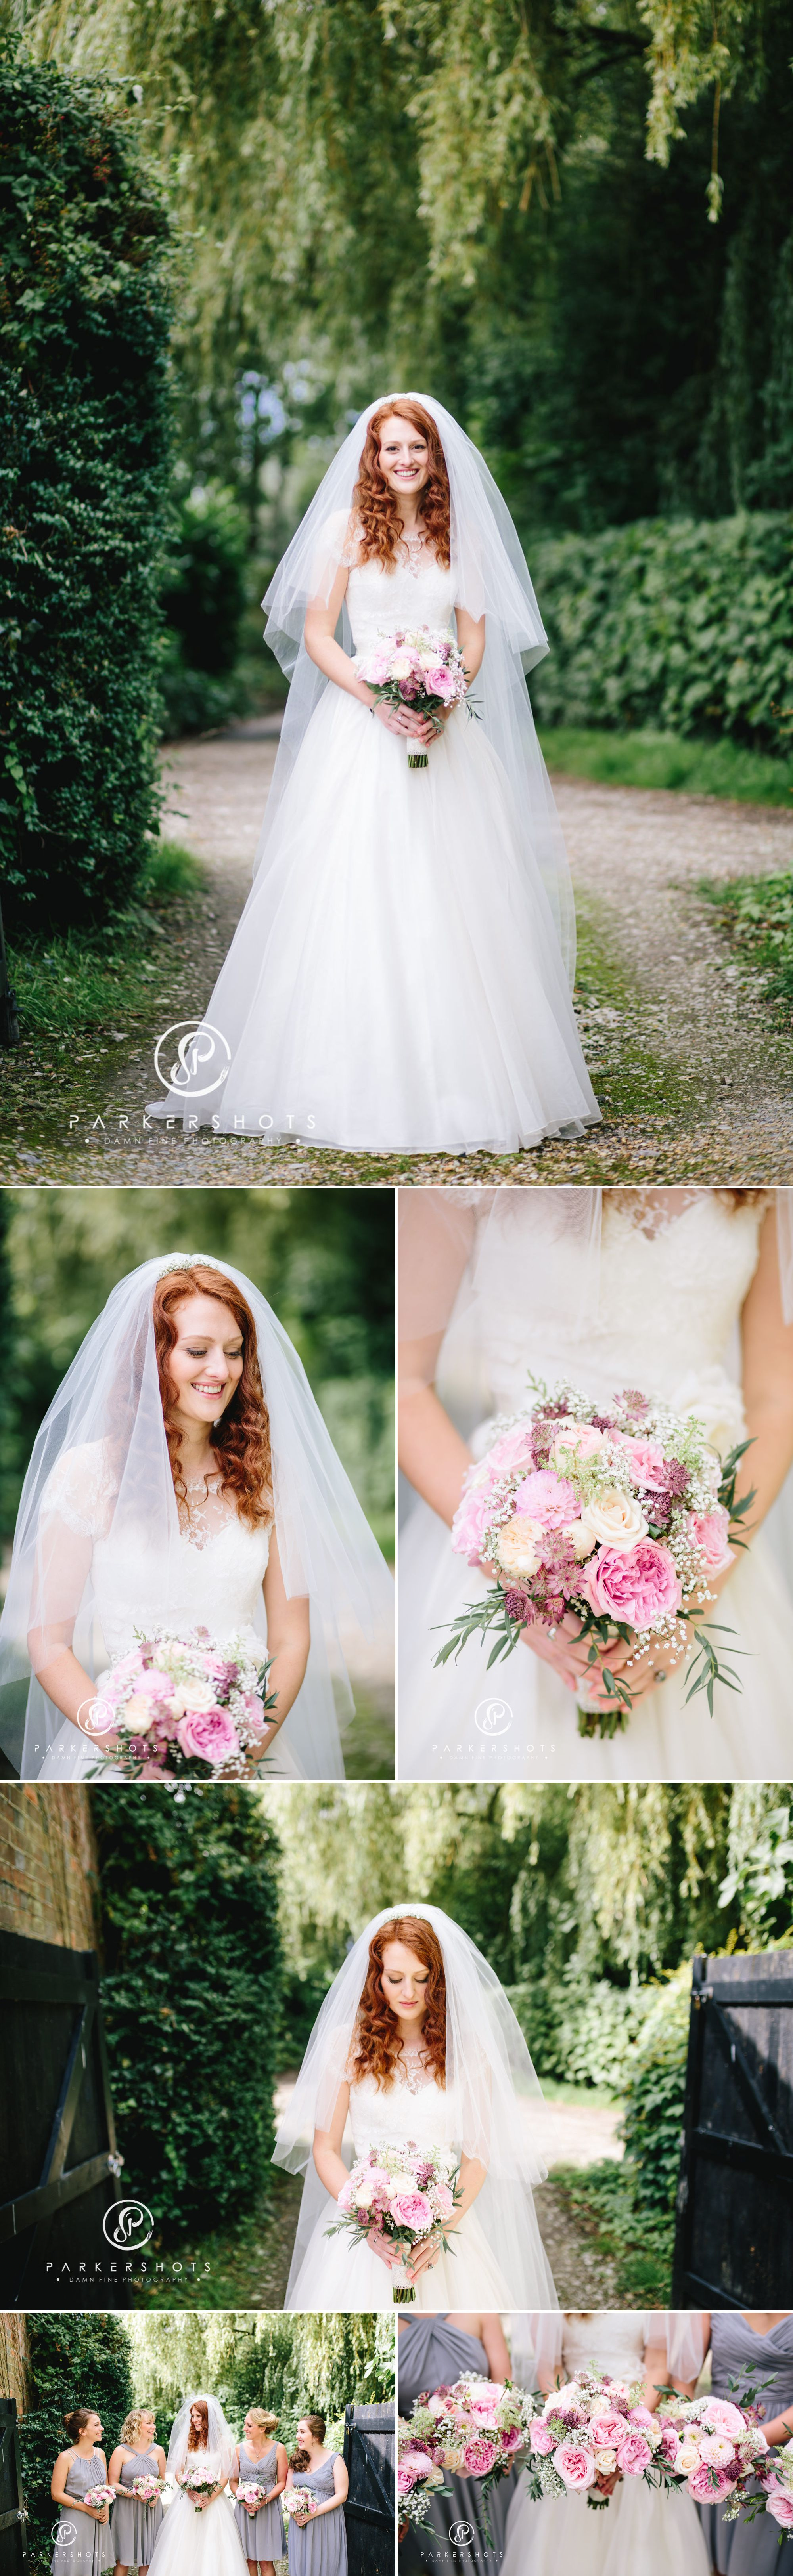 Chiddingstone_Castle_Wedding_Photographer 5